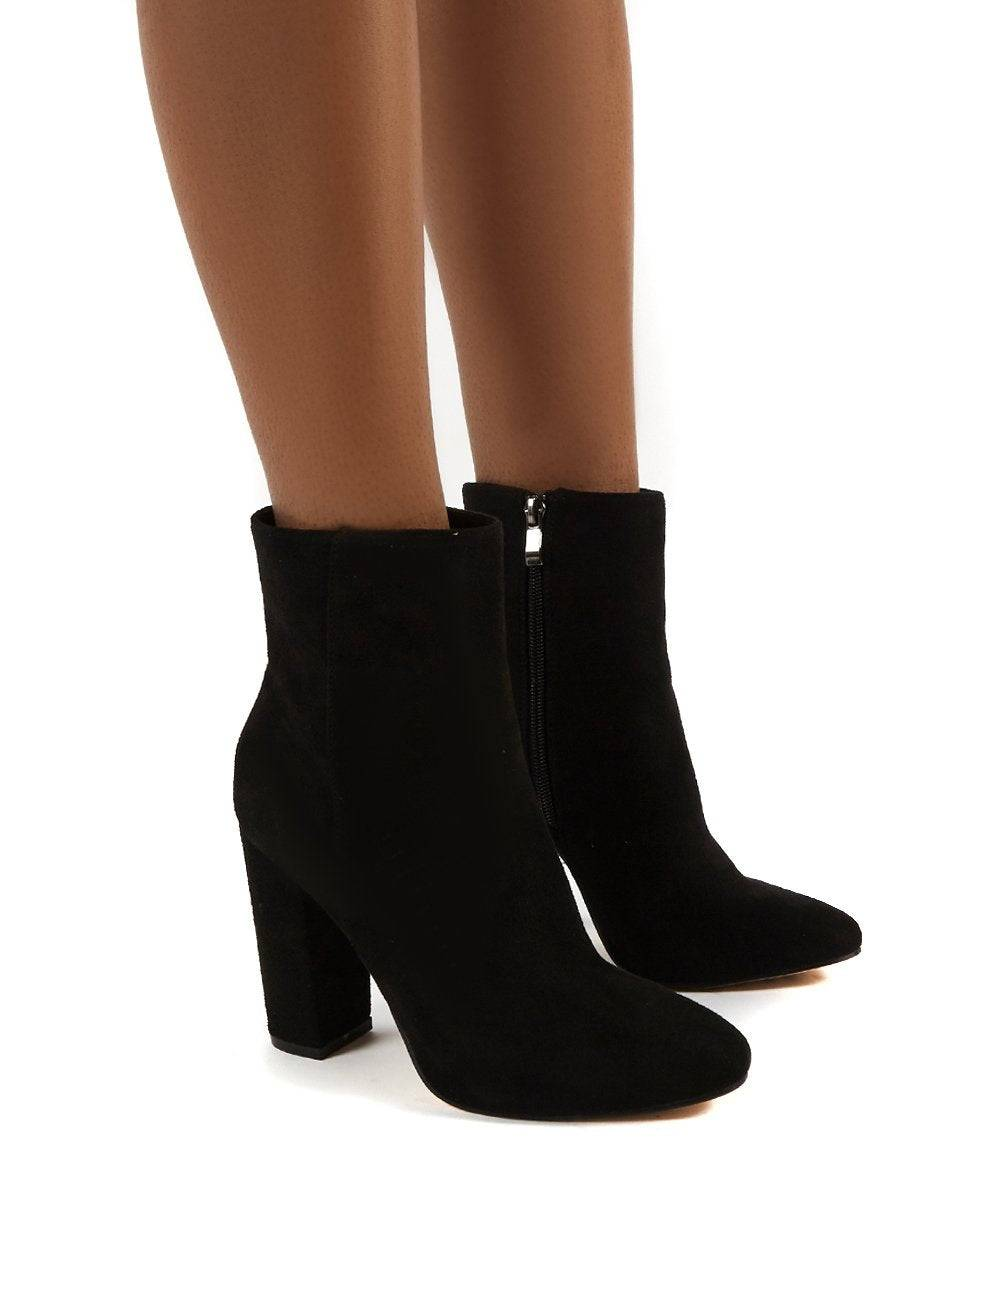 Public Desire US Presley Ankle Boots in Black Faux Suede - US 9